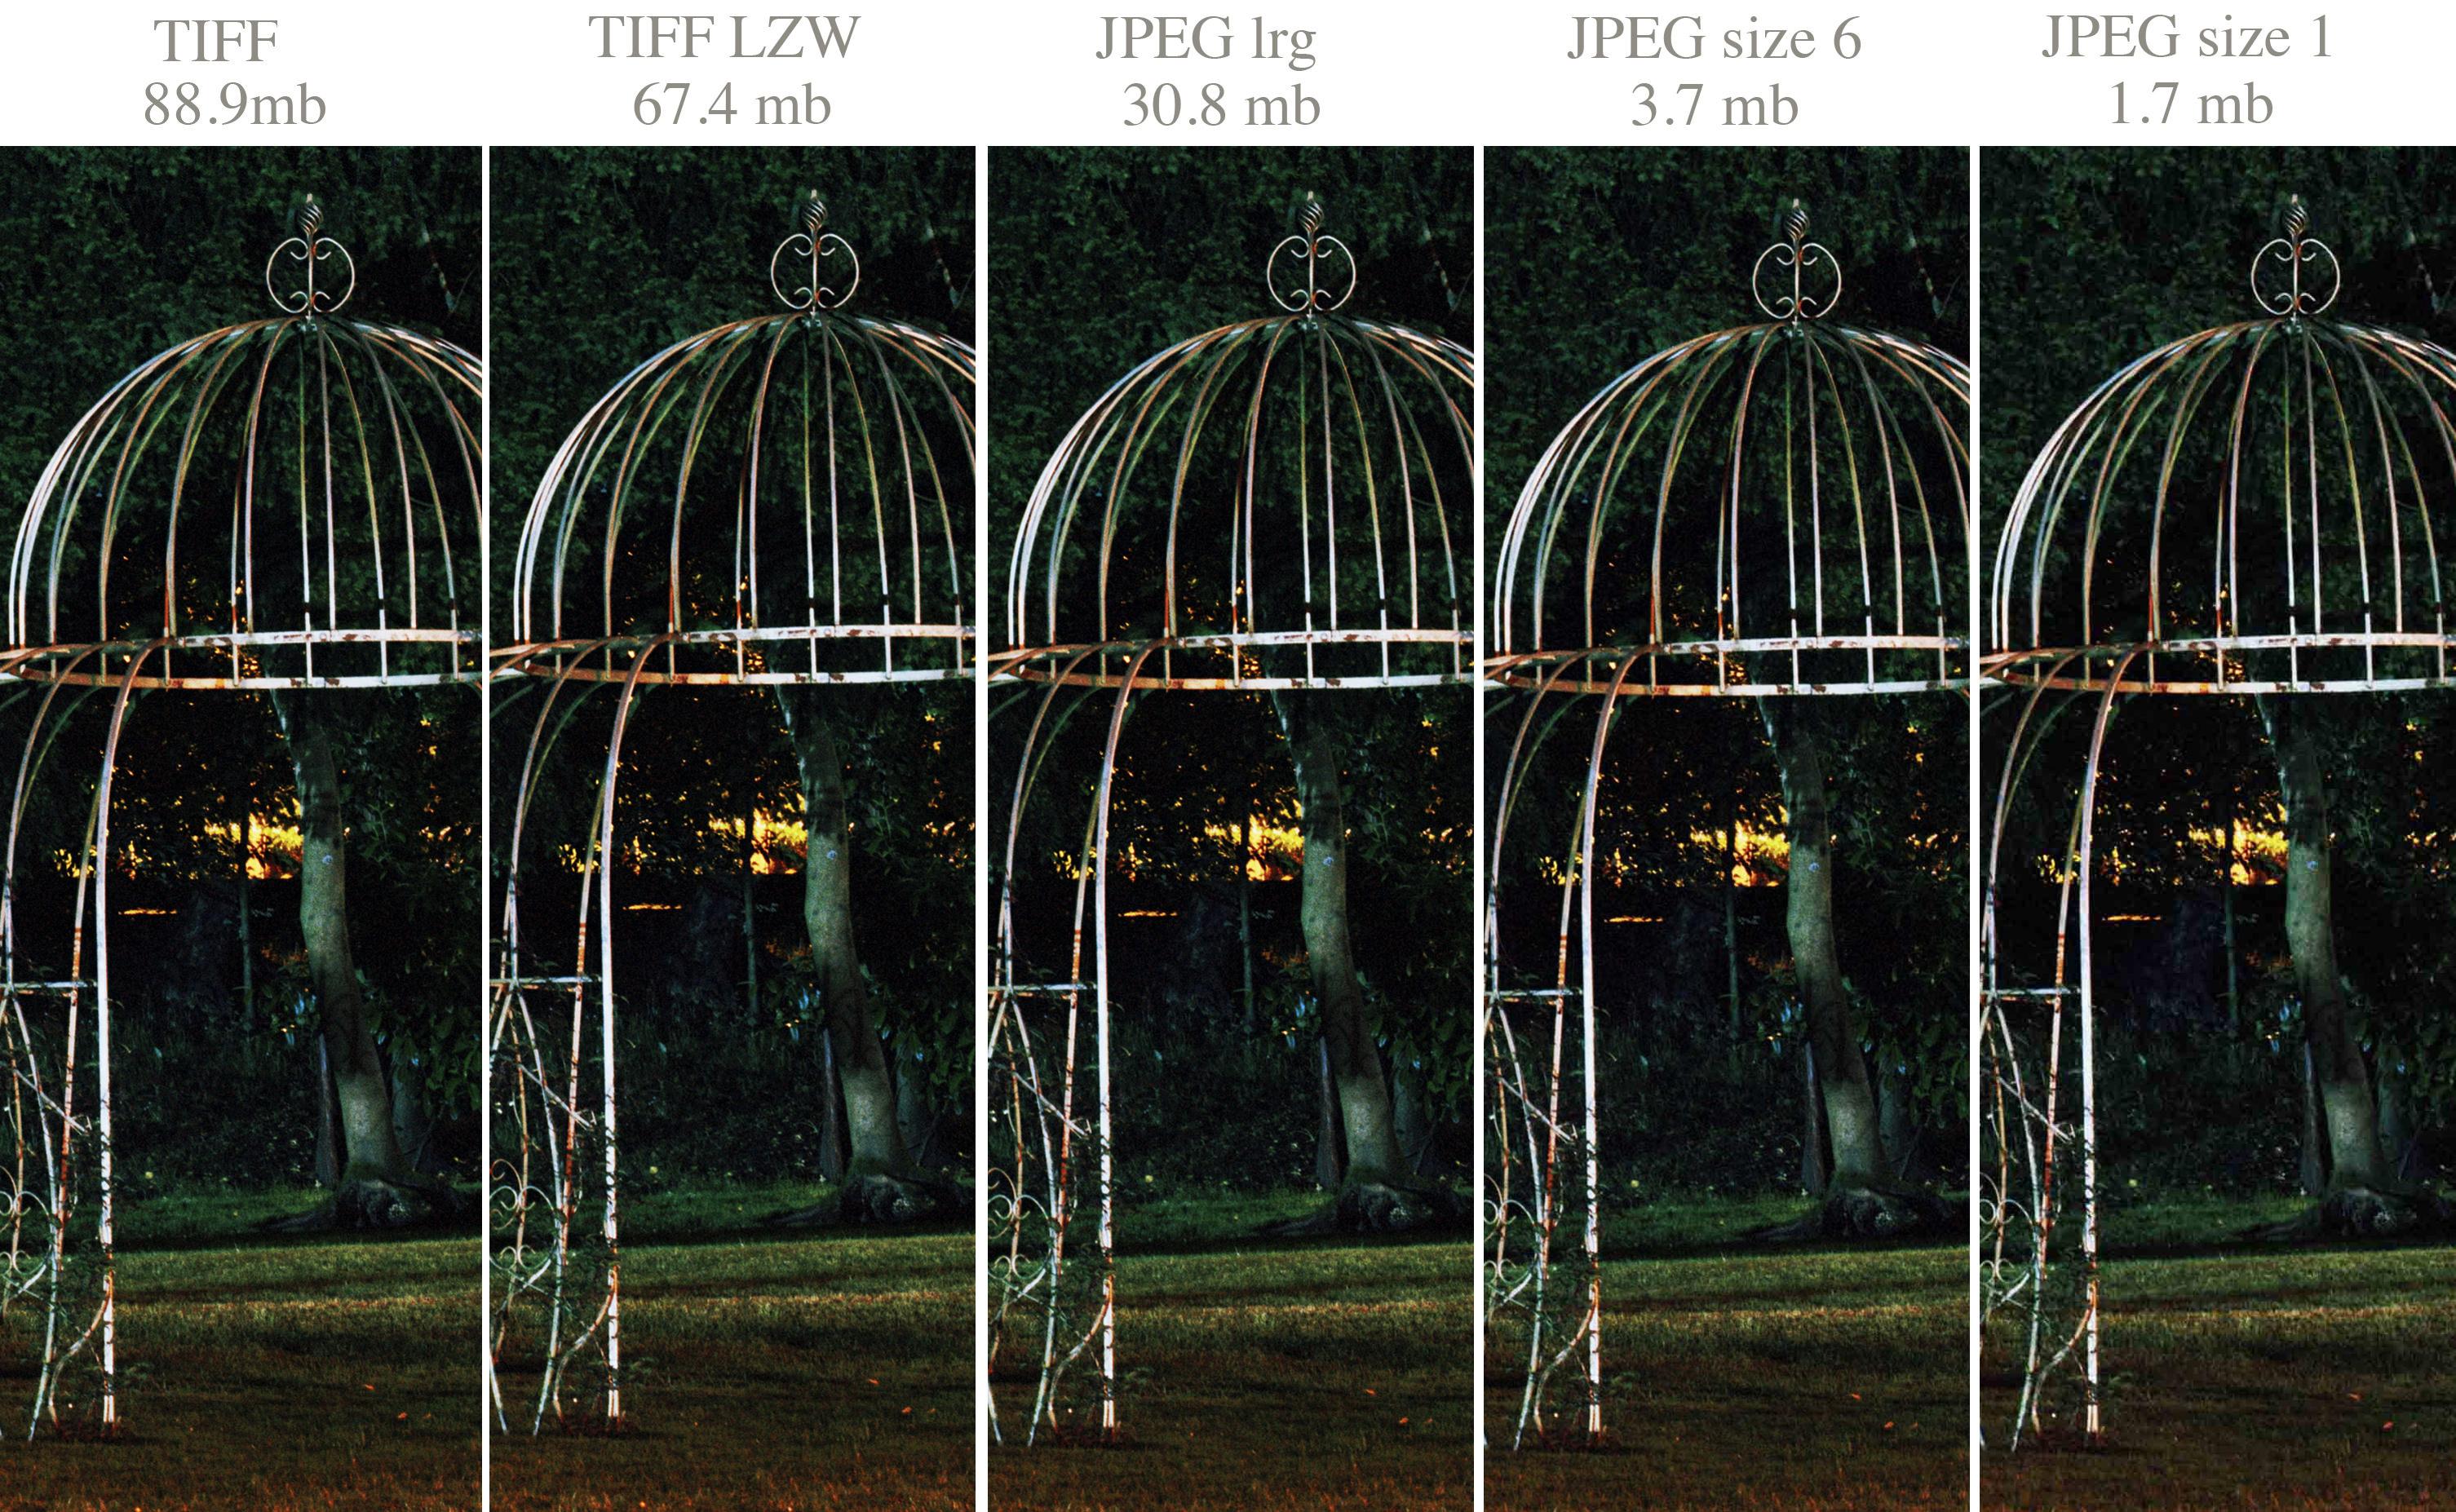 JPEG Or TIFF For The Best Quality Prints? | ePHOTOzine